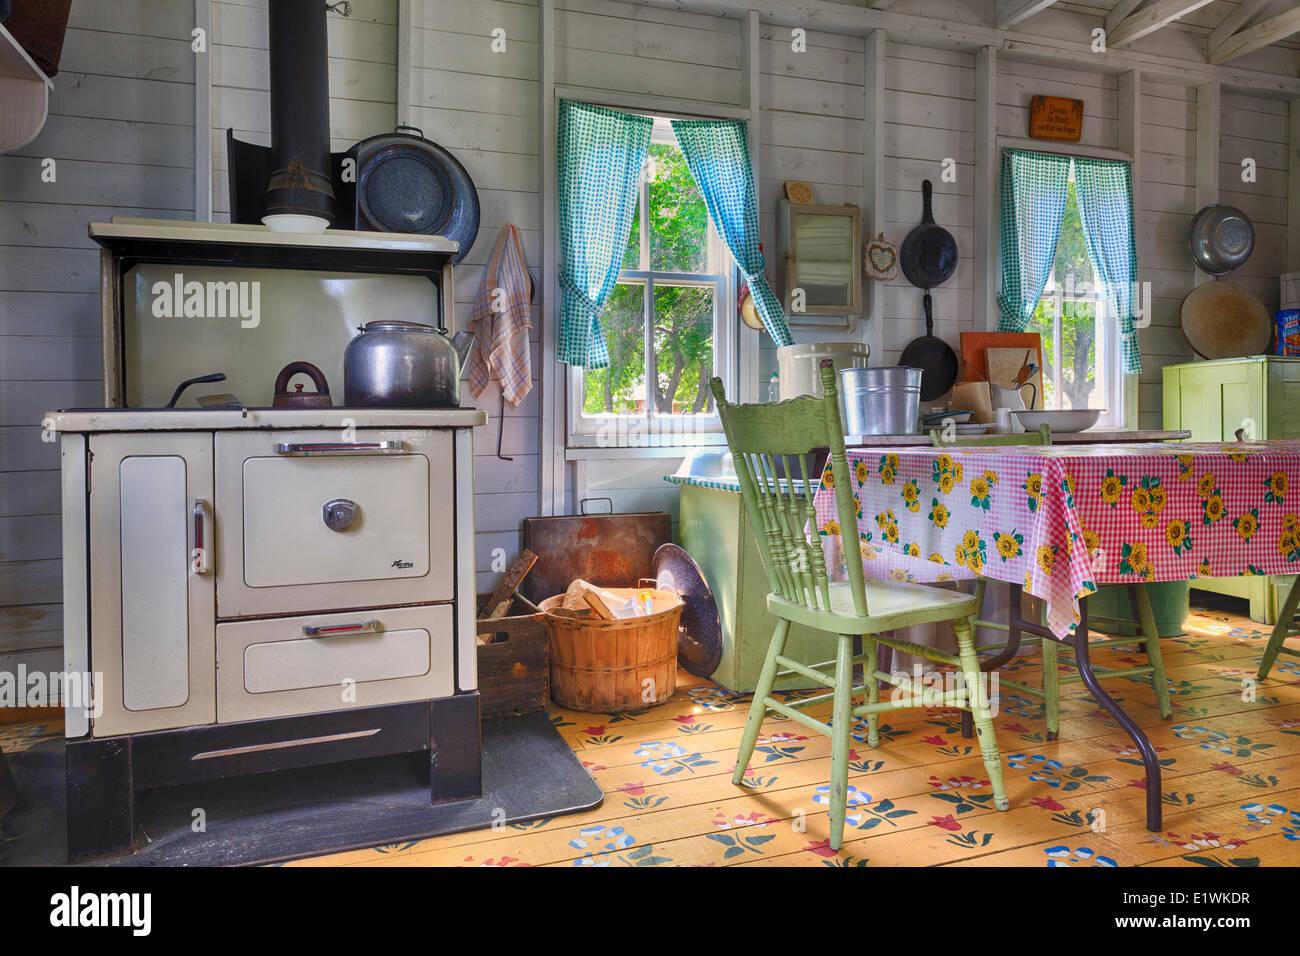 Sommerküche Zum Vorbereiten : Sommerküche stockfotos sommerküche bilder alamy